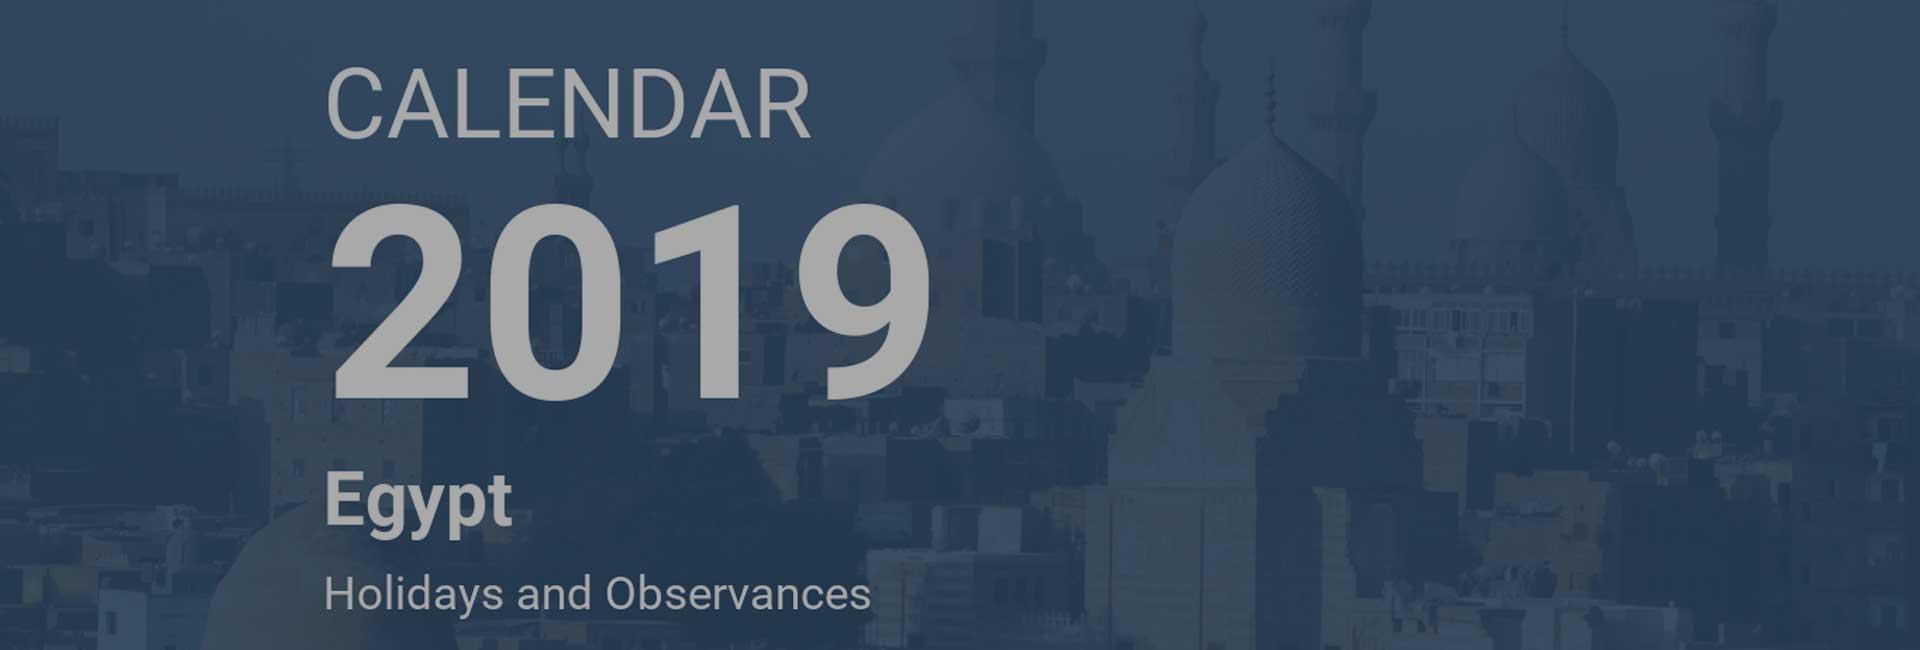 Egypt: Calendars and Holidays